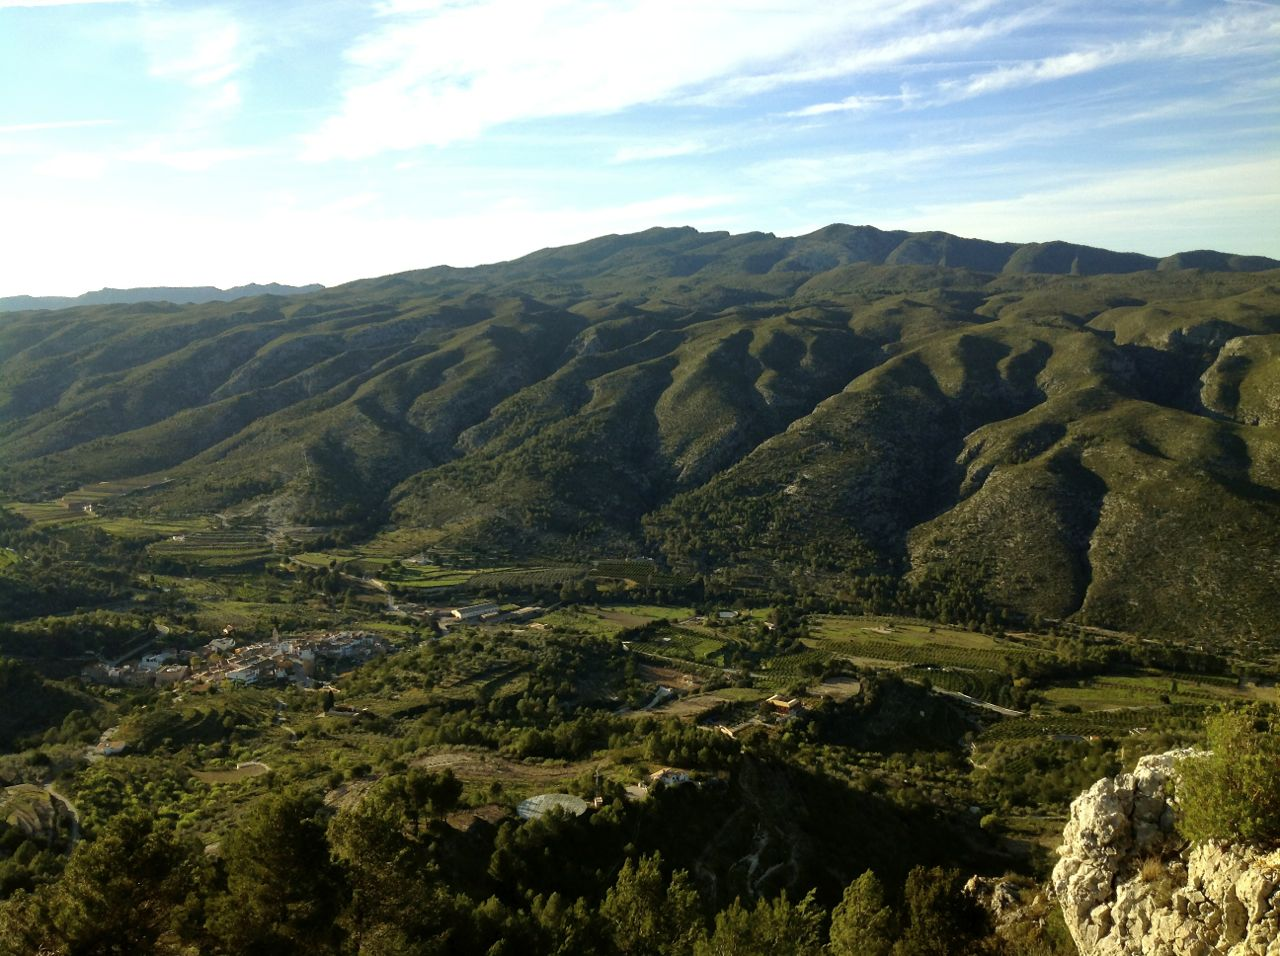 Benialí a resguardo de sus Sierras